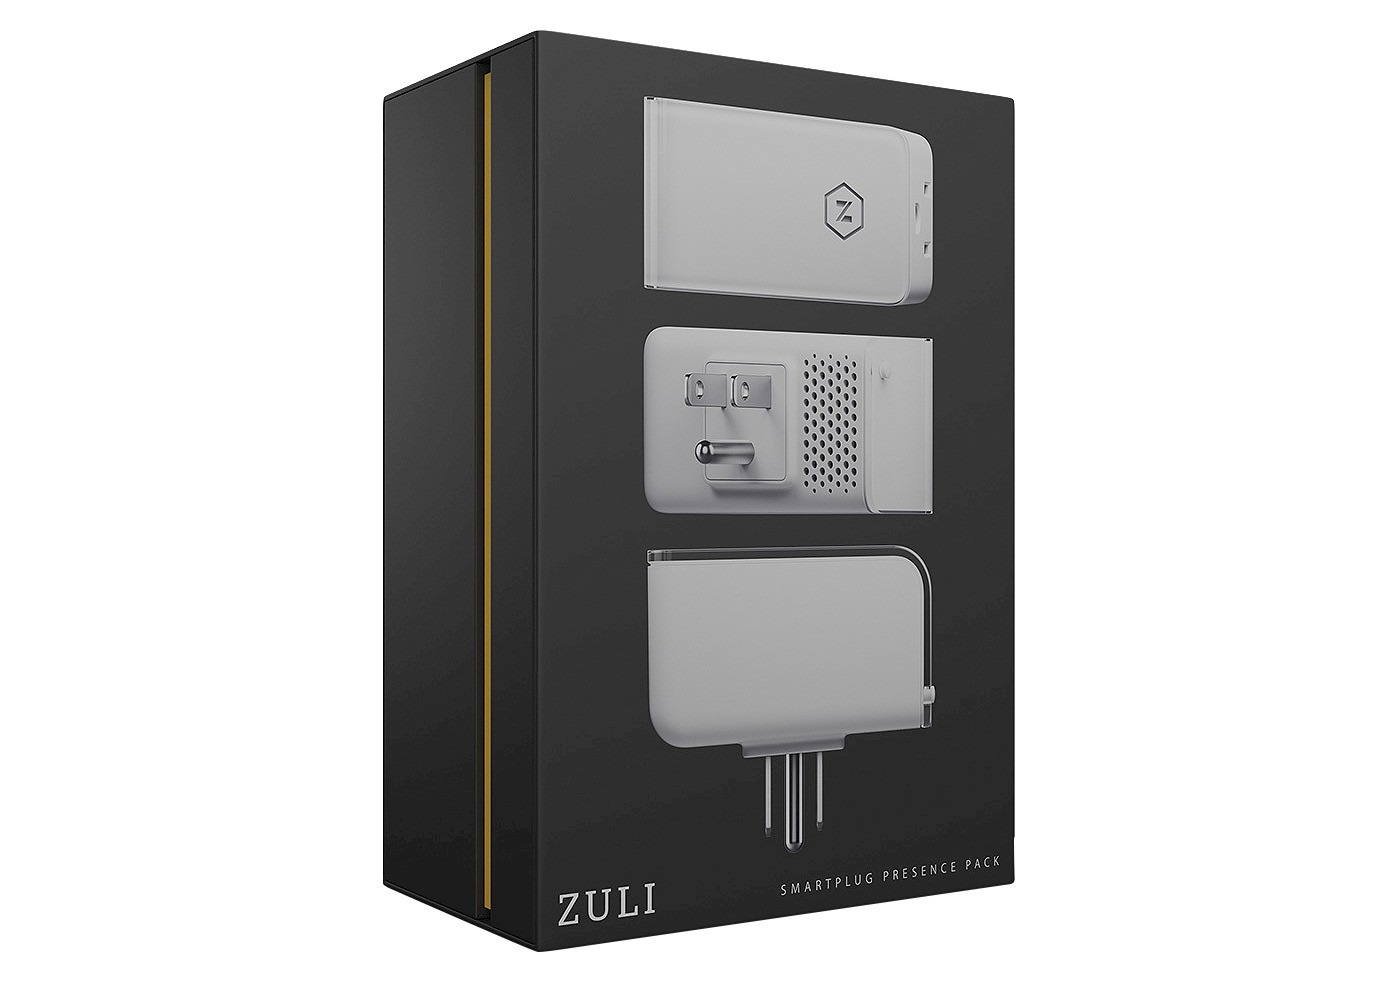 Zuli Smartplug Home Control, Dimmer, Energy Monito